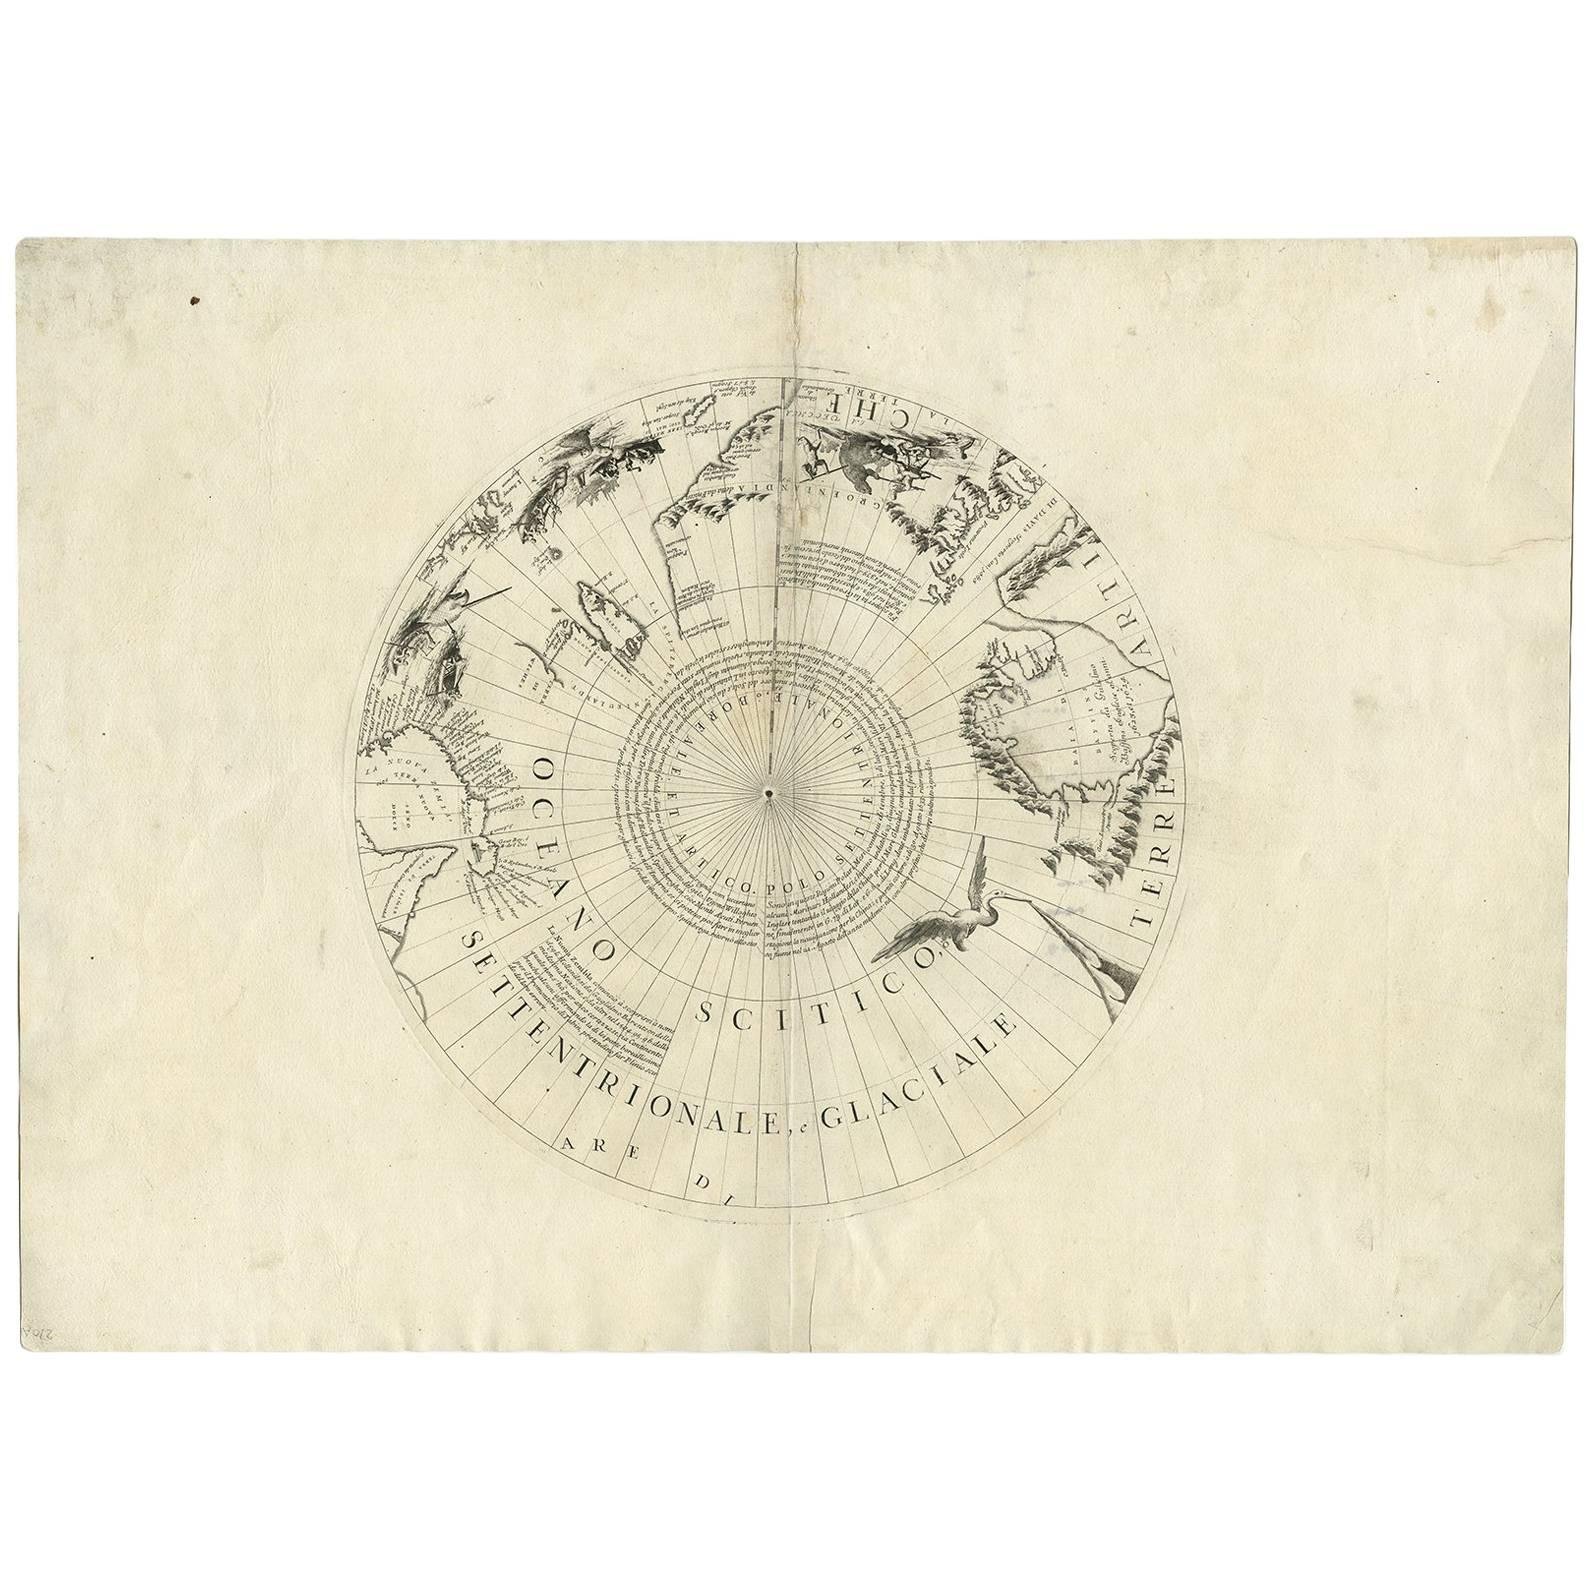 Antique Map of the North Pole by V.M. Coronelli, circa 1692